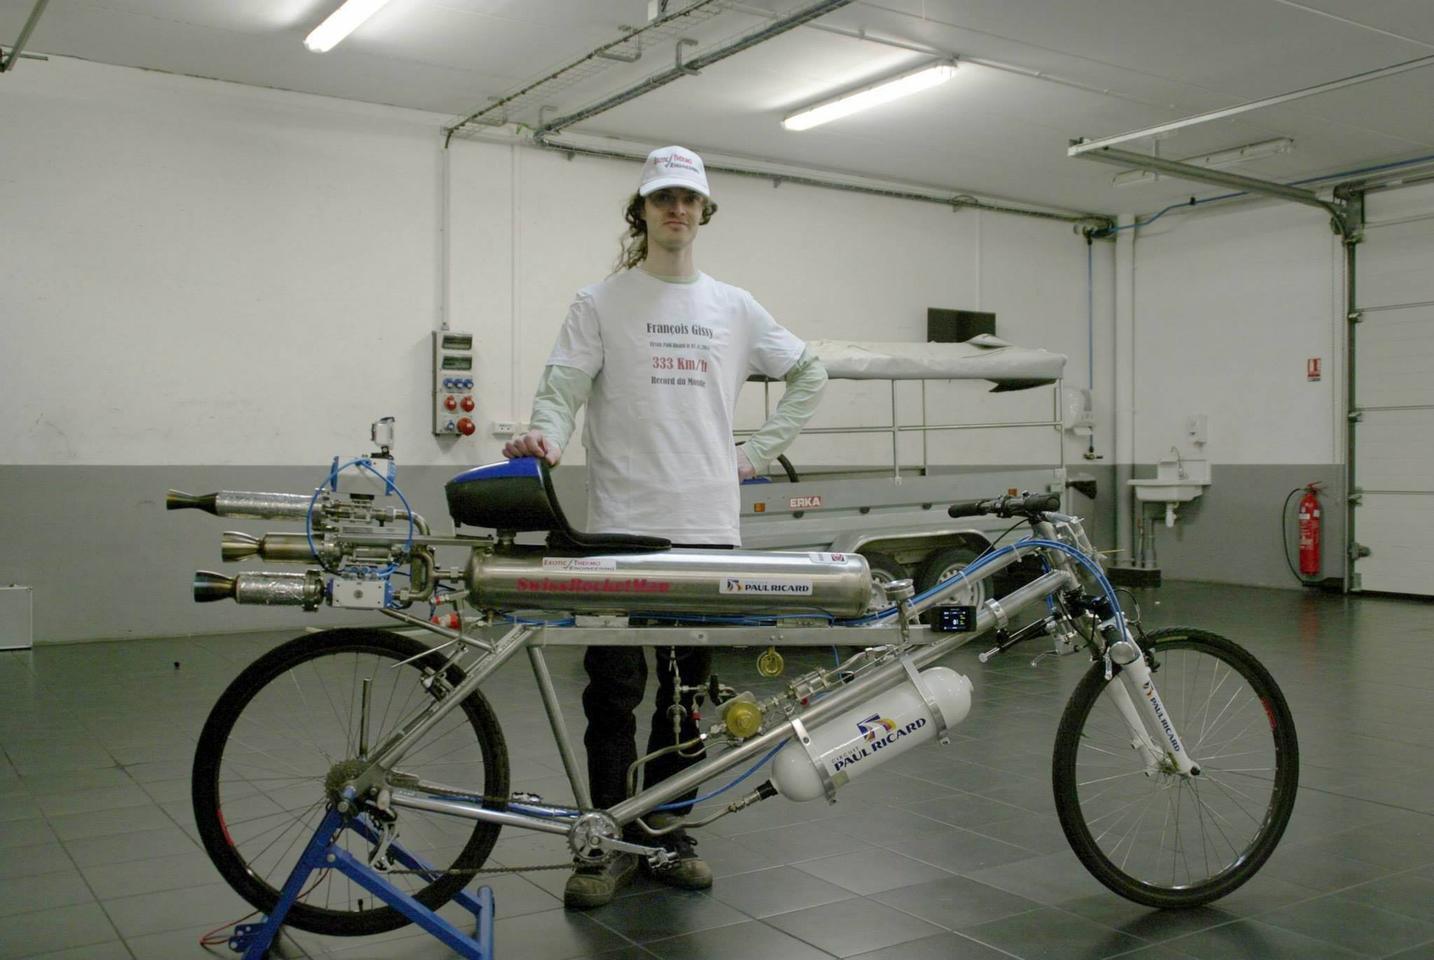 Francois Gissy's rocket bicycle (Photo: Gerard Toutin / Exotic Thermo Engineering)